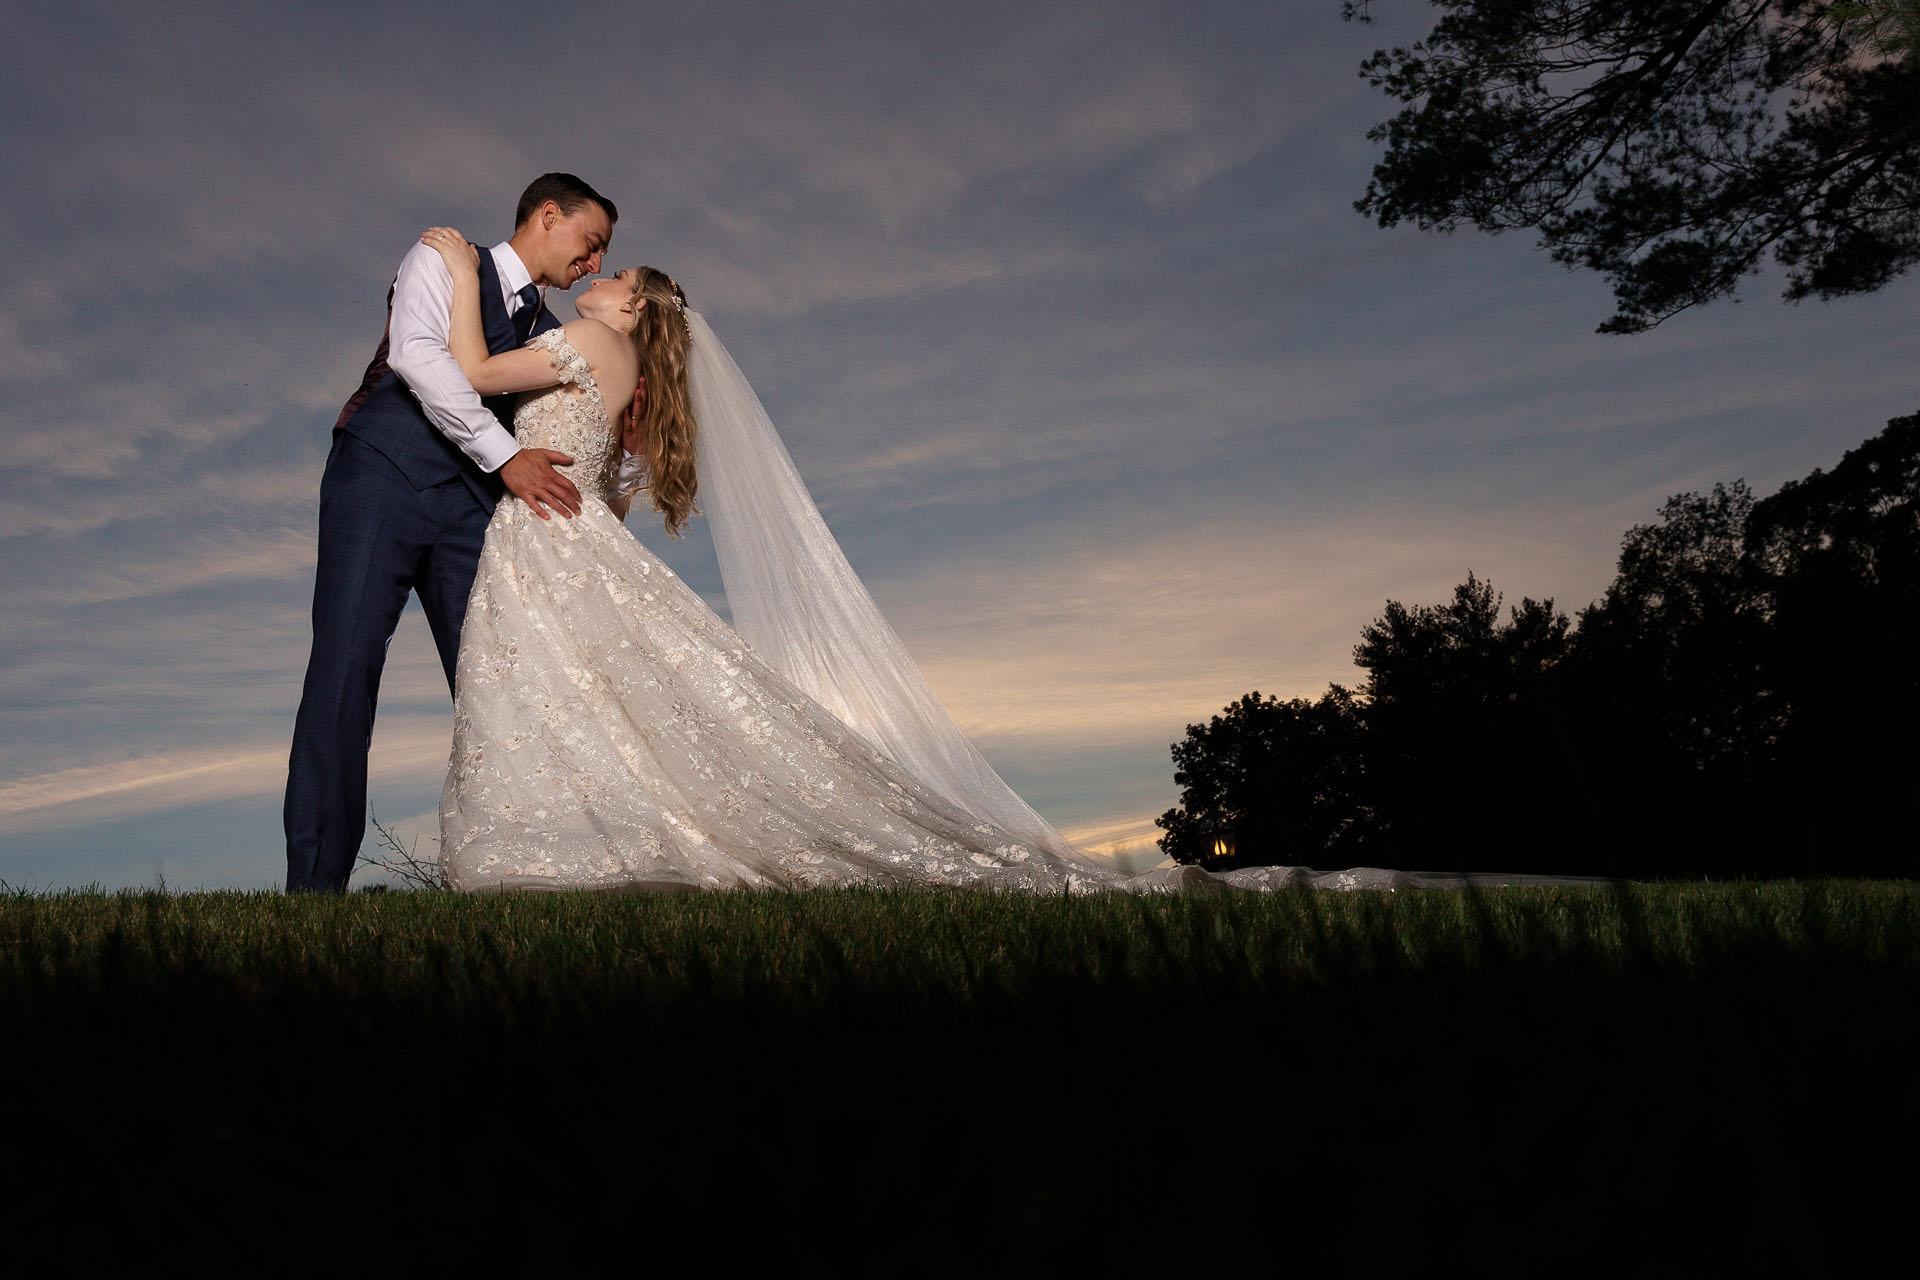 Publick house Wedding photography